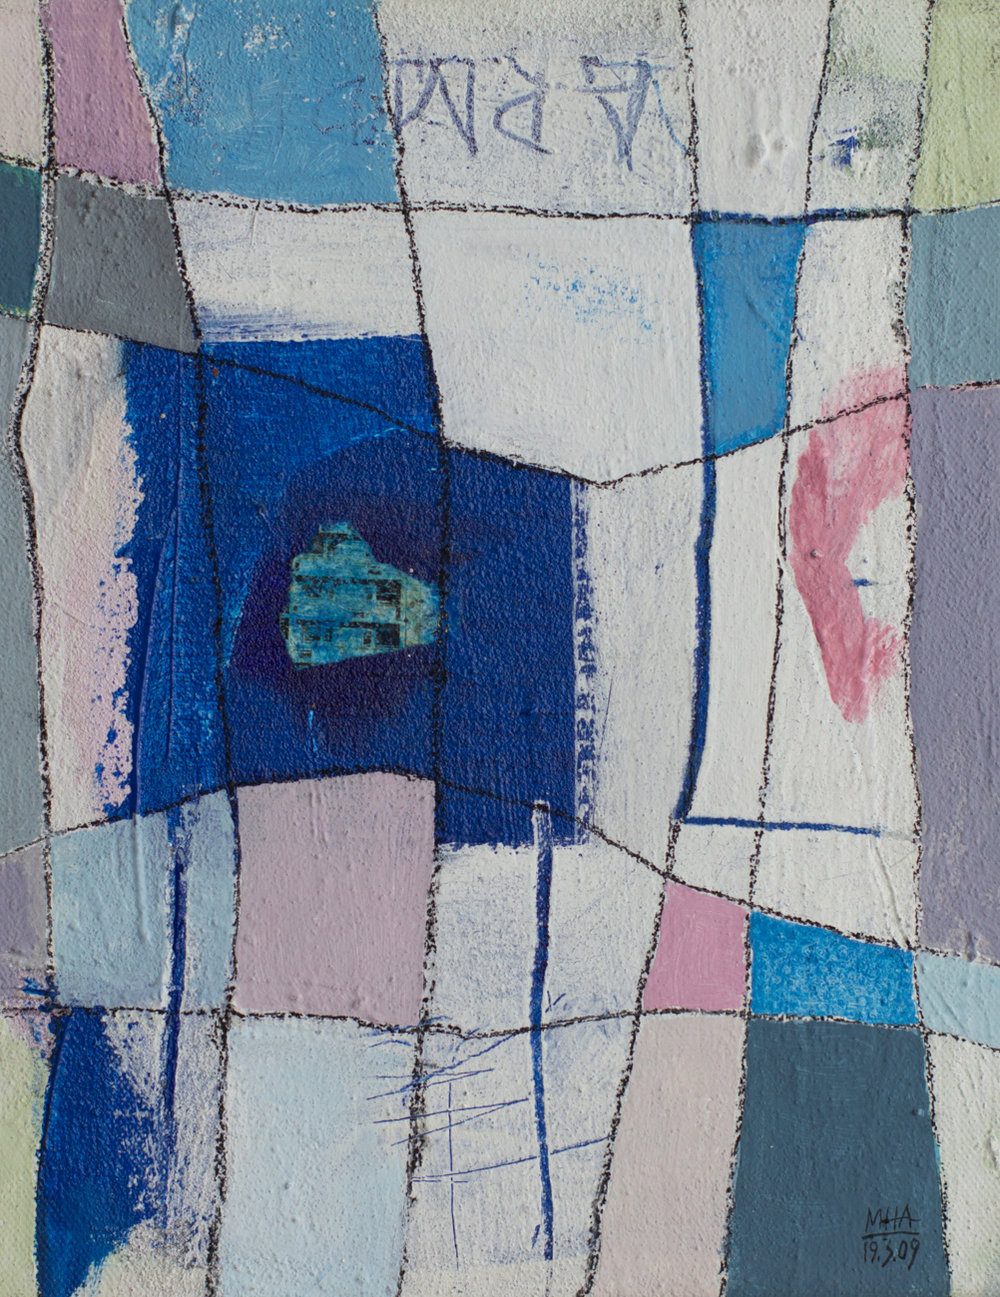 Fantasie in Linien 3 , 2009,Acryl auf Leinwand, 24x30 cm